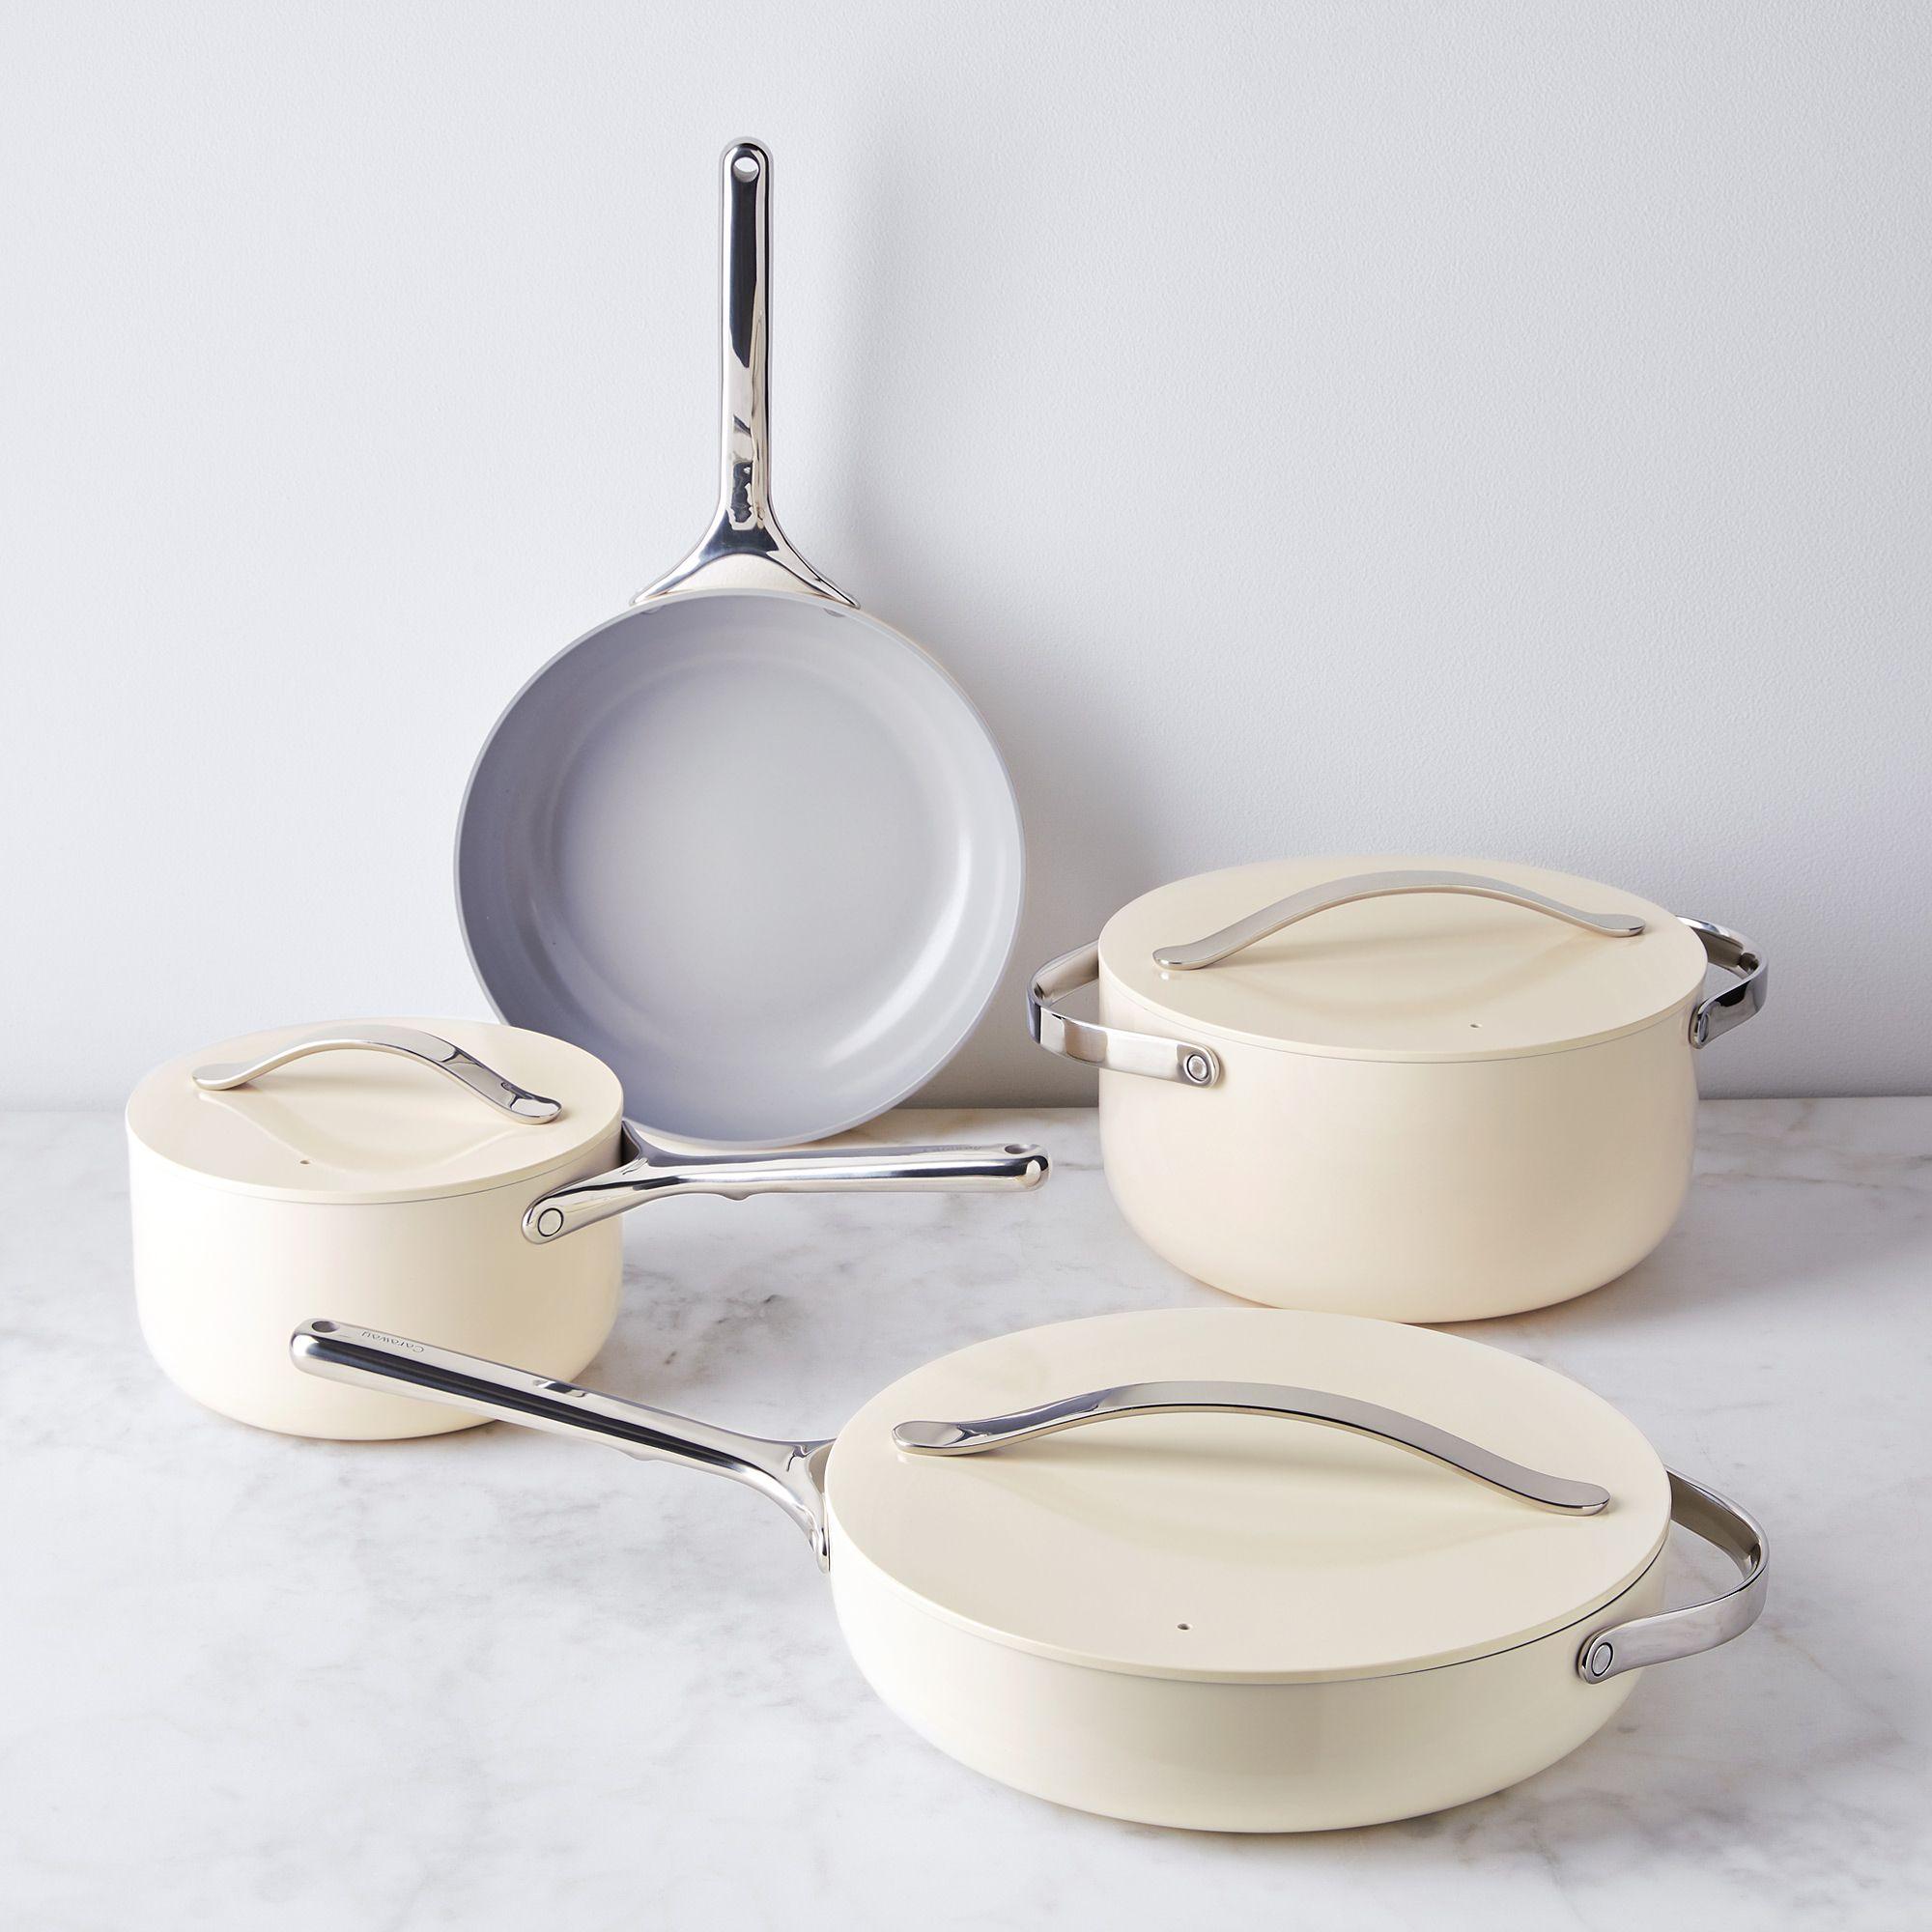 Cookware Set In 2020 Ceramic Non Stick Cookware Set New Home Essentials